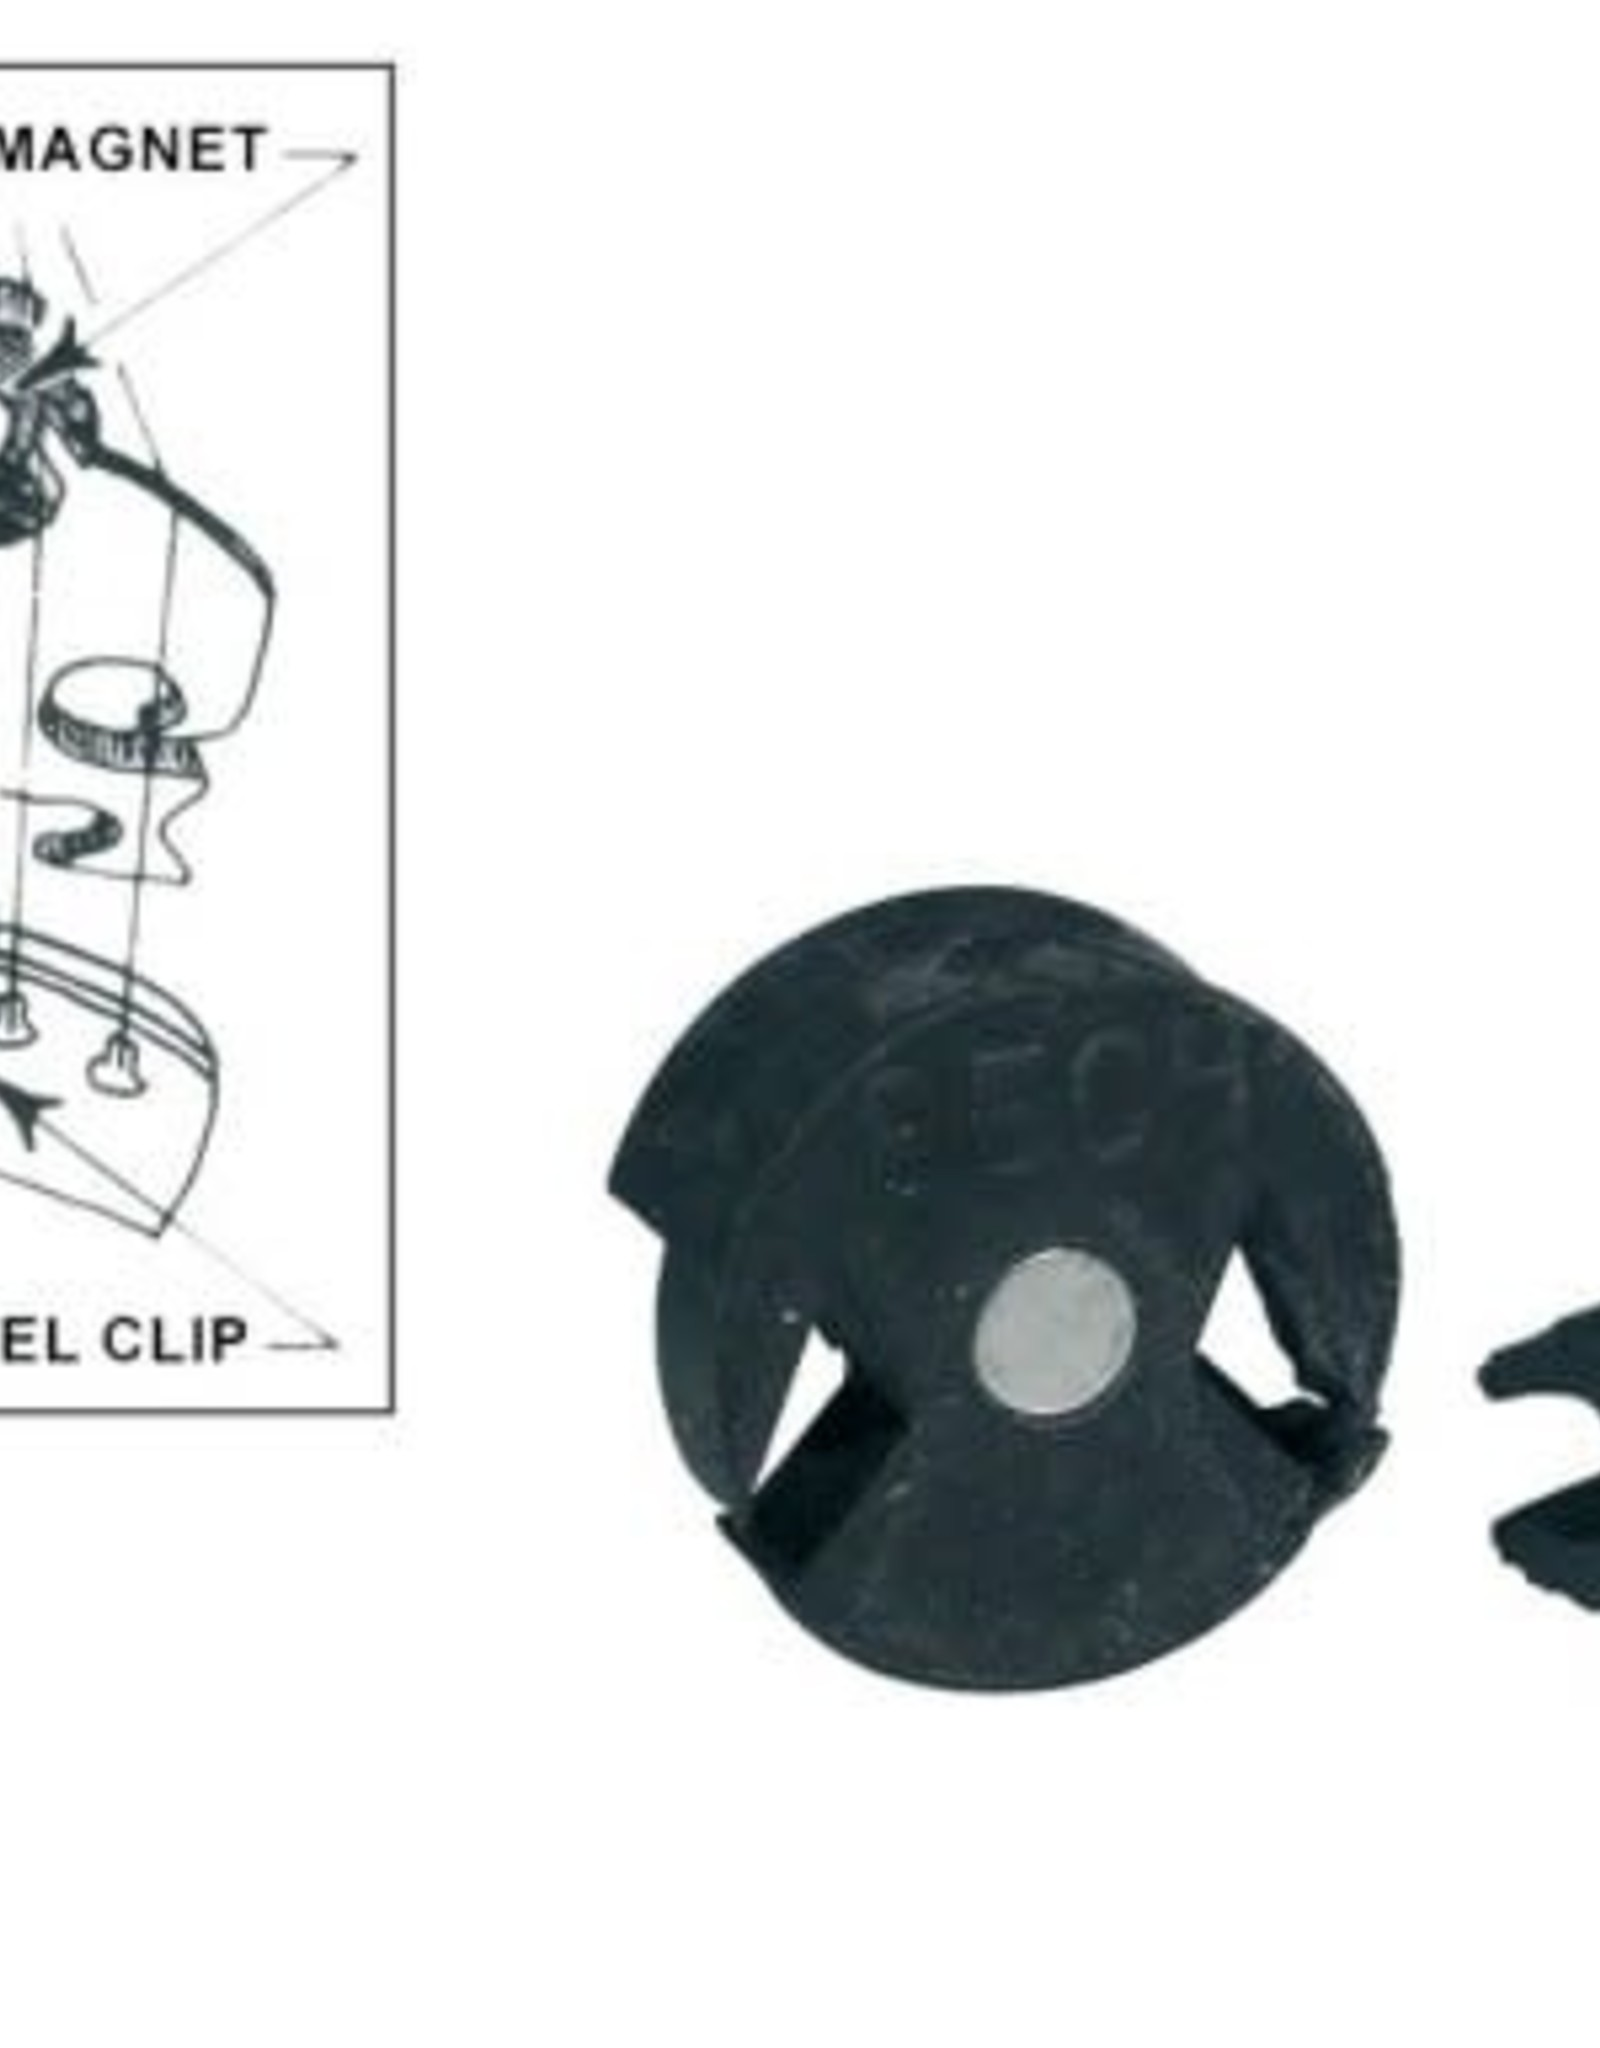 Violin/viola demper, bech model, rubber met magneet